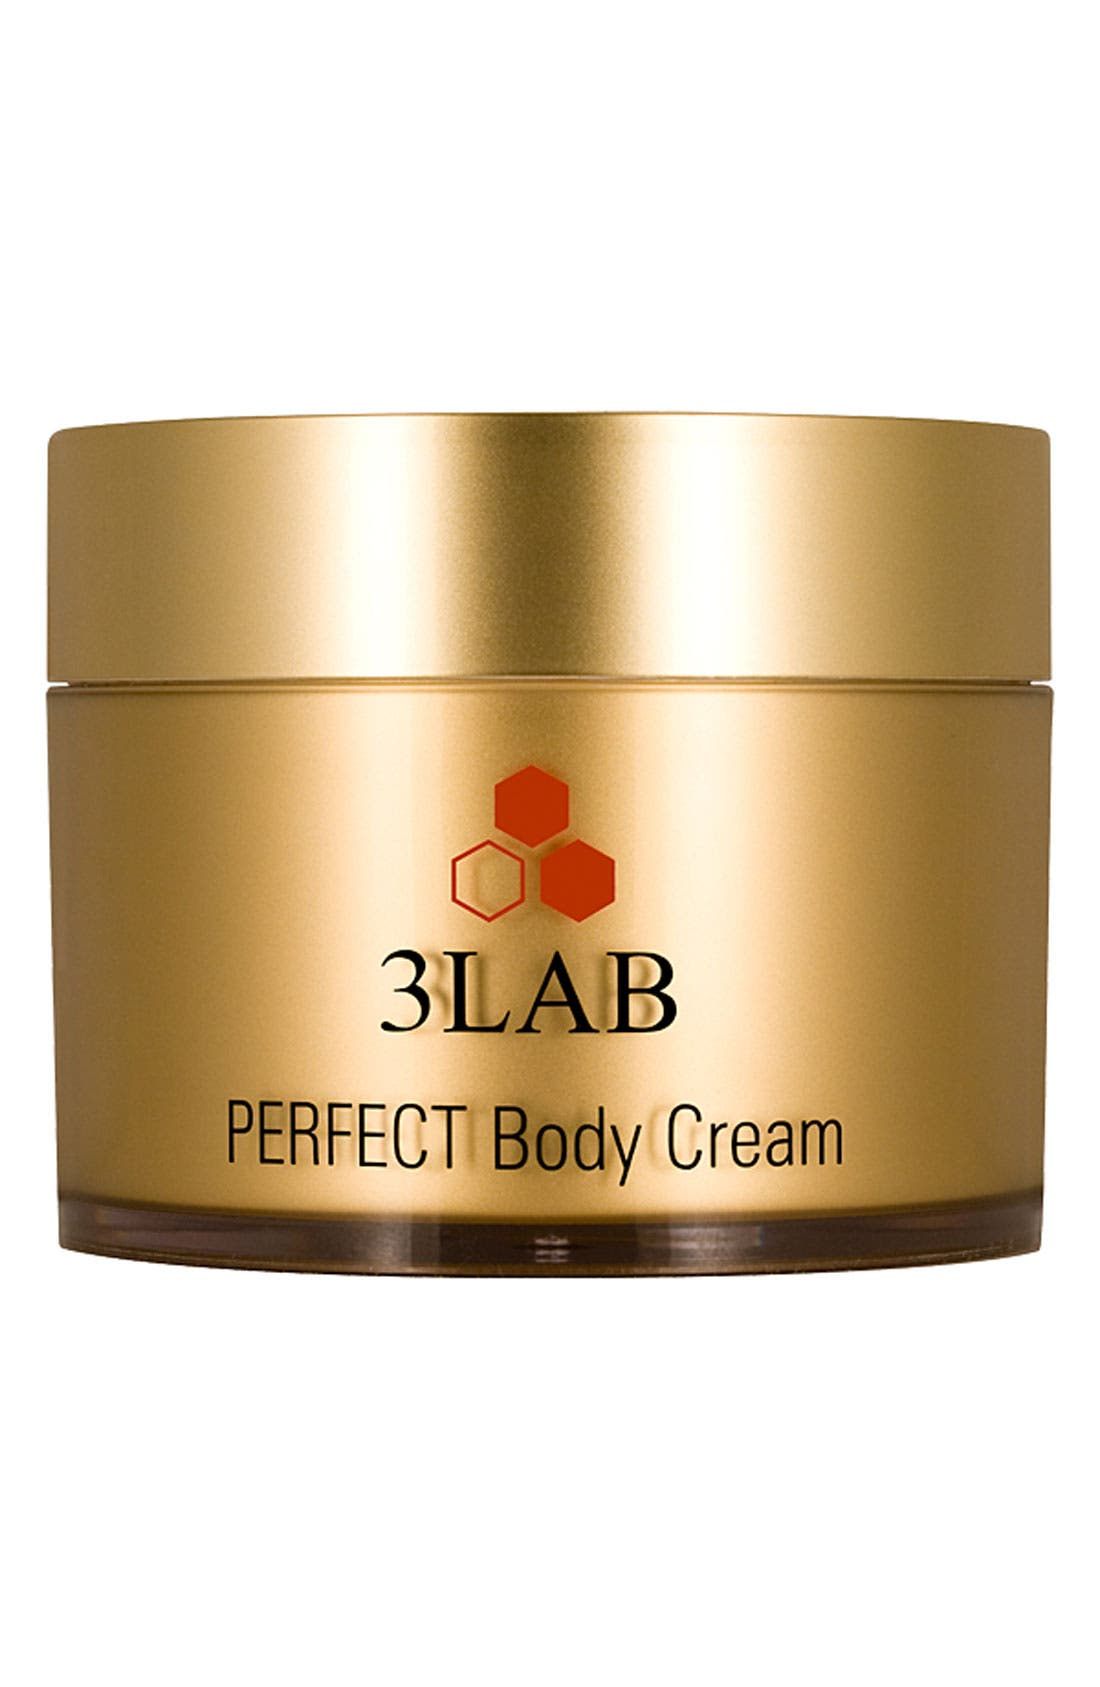 3LAB Perfect Body Cream